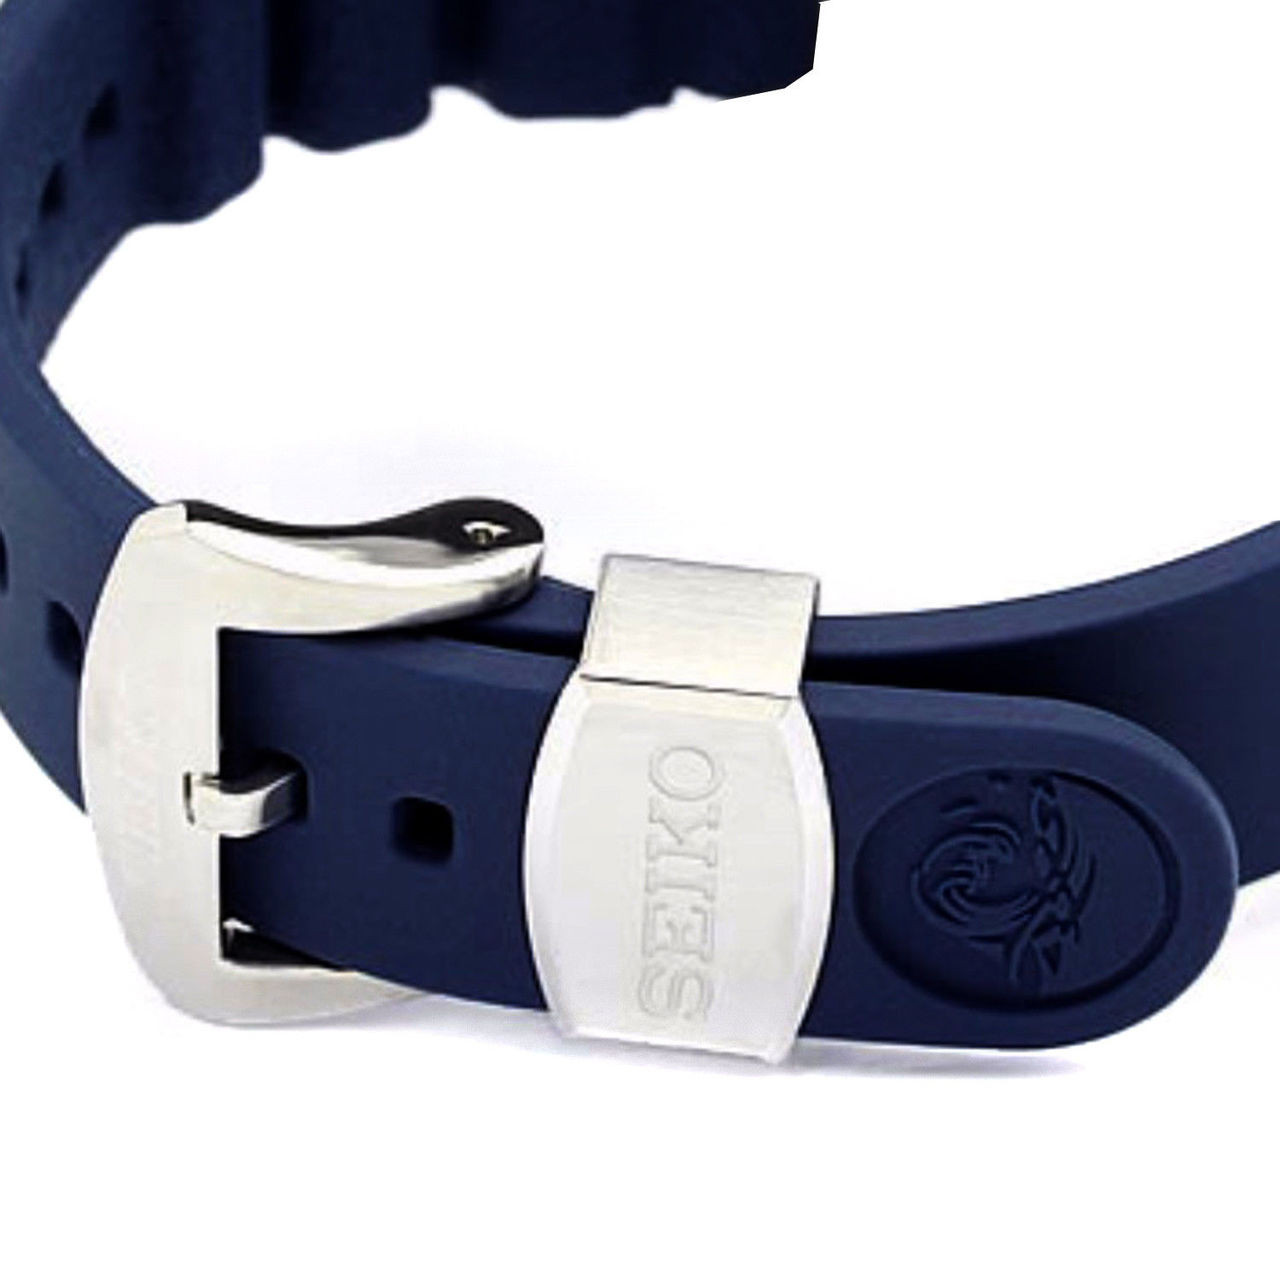 Seiko SRPA83 Blue Rubber Watch Band Prospex Padi 22mm